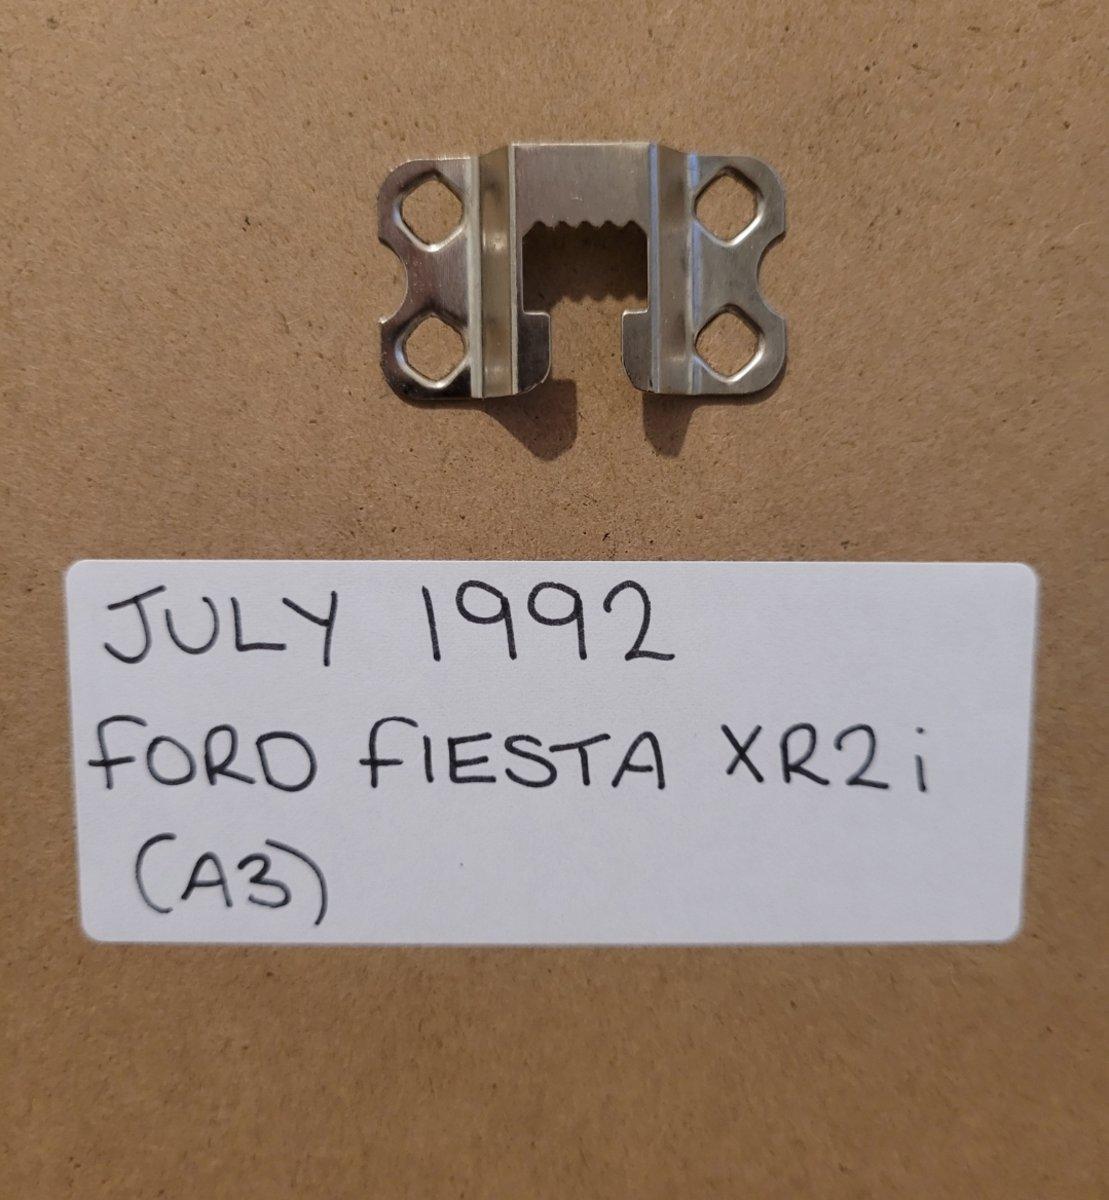 1991 Original 1992 Ford Fiesta XR2i Framed Advert For Sale (picture 2 of 3)